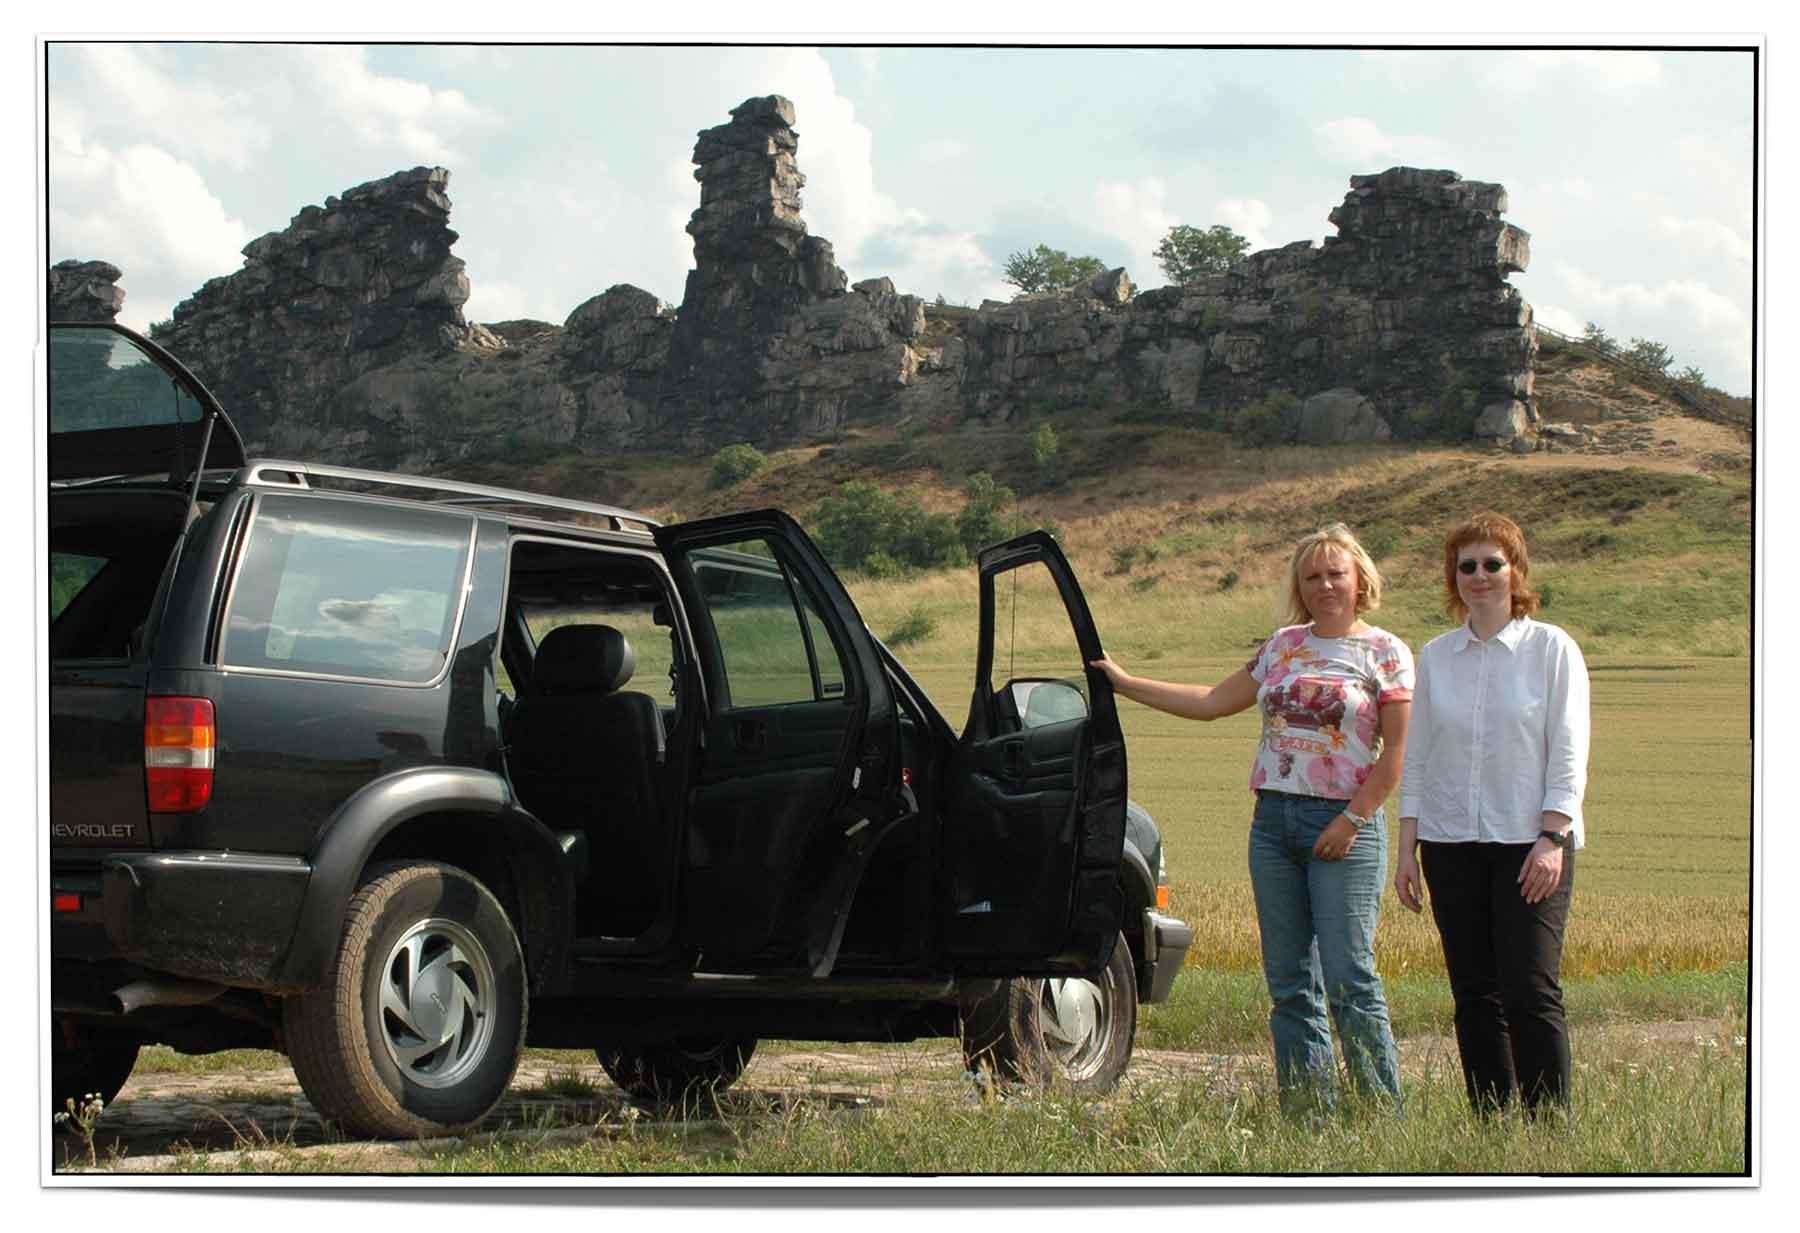 Kirsten Broska-Rogge und Antje Winzer an der Teufelsmauer